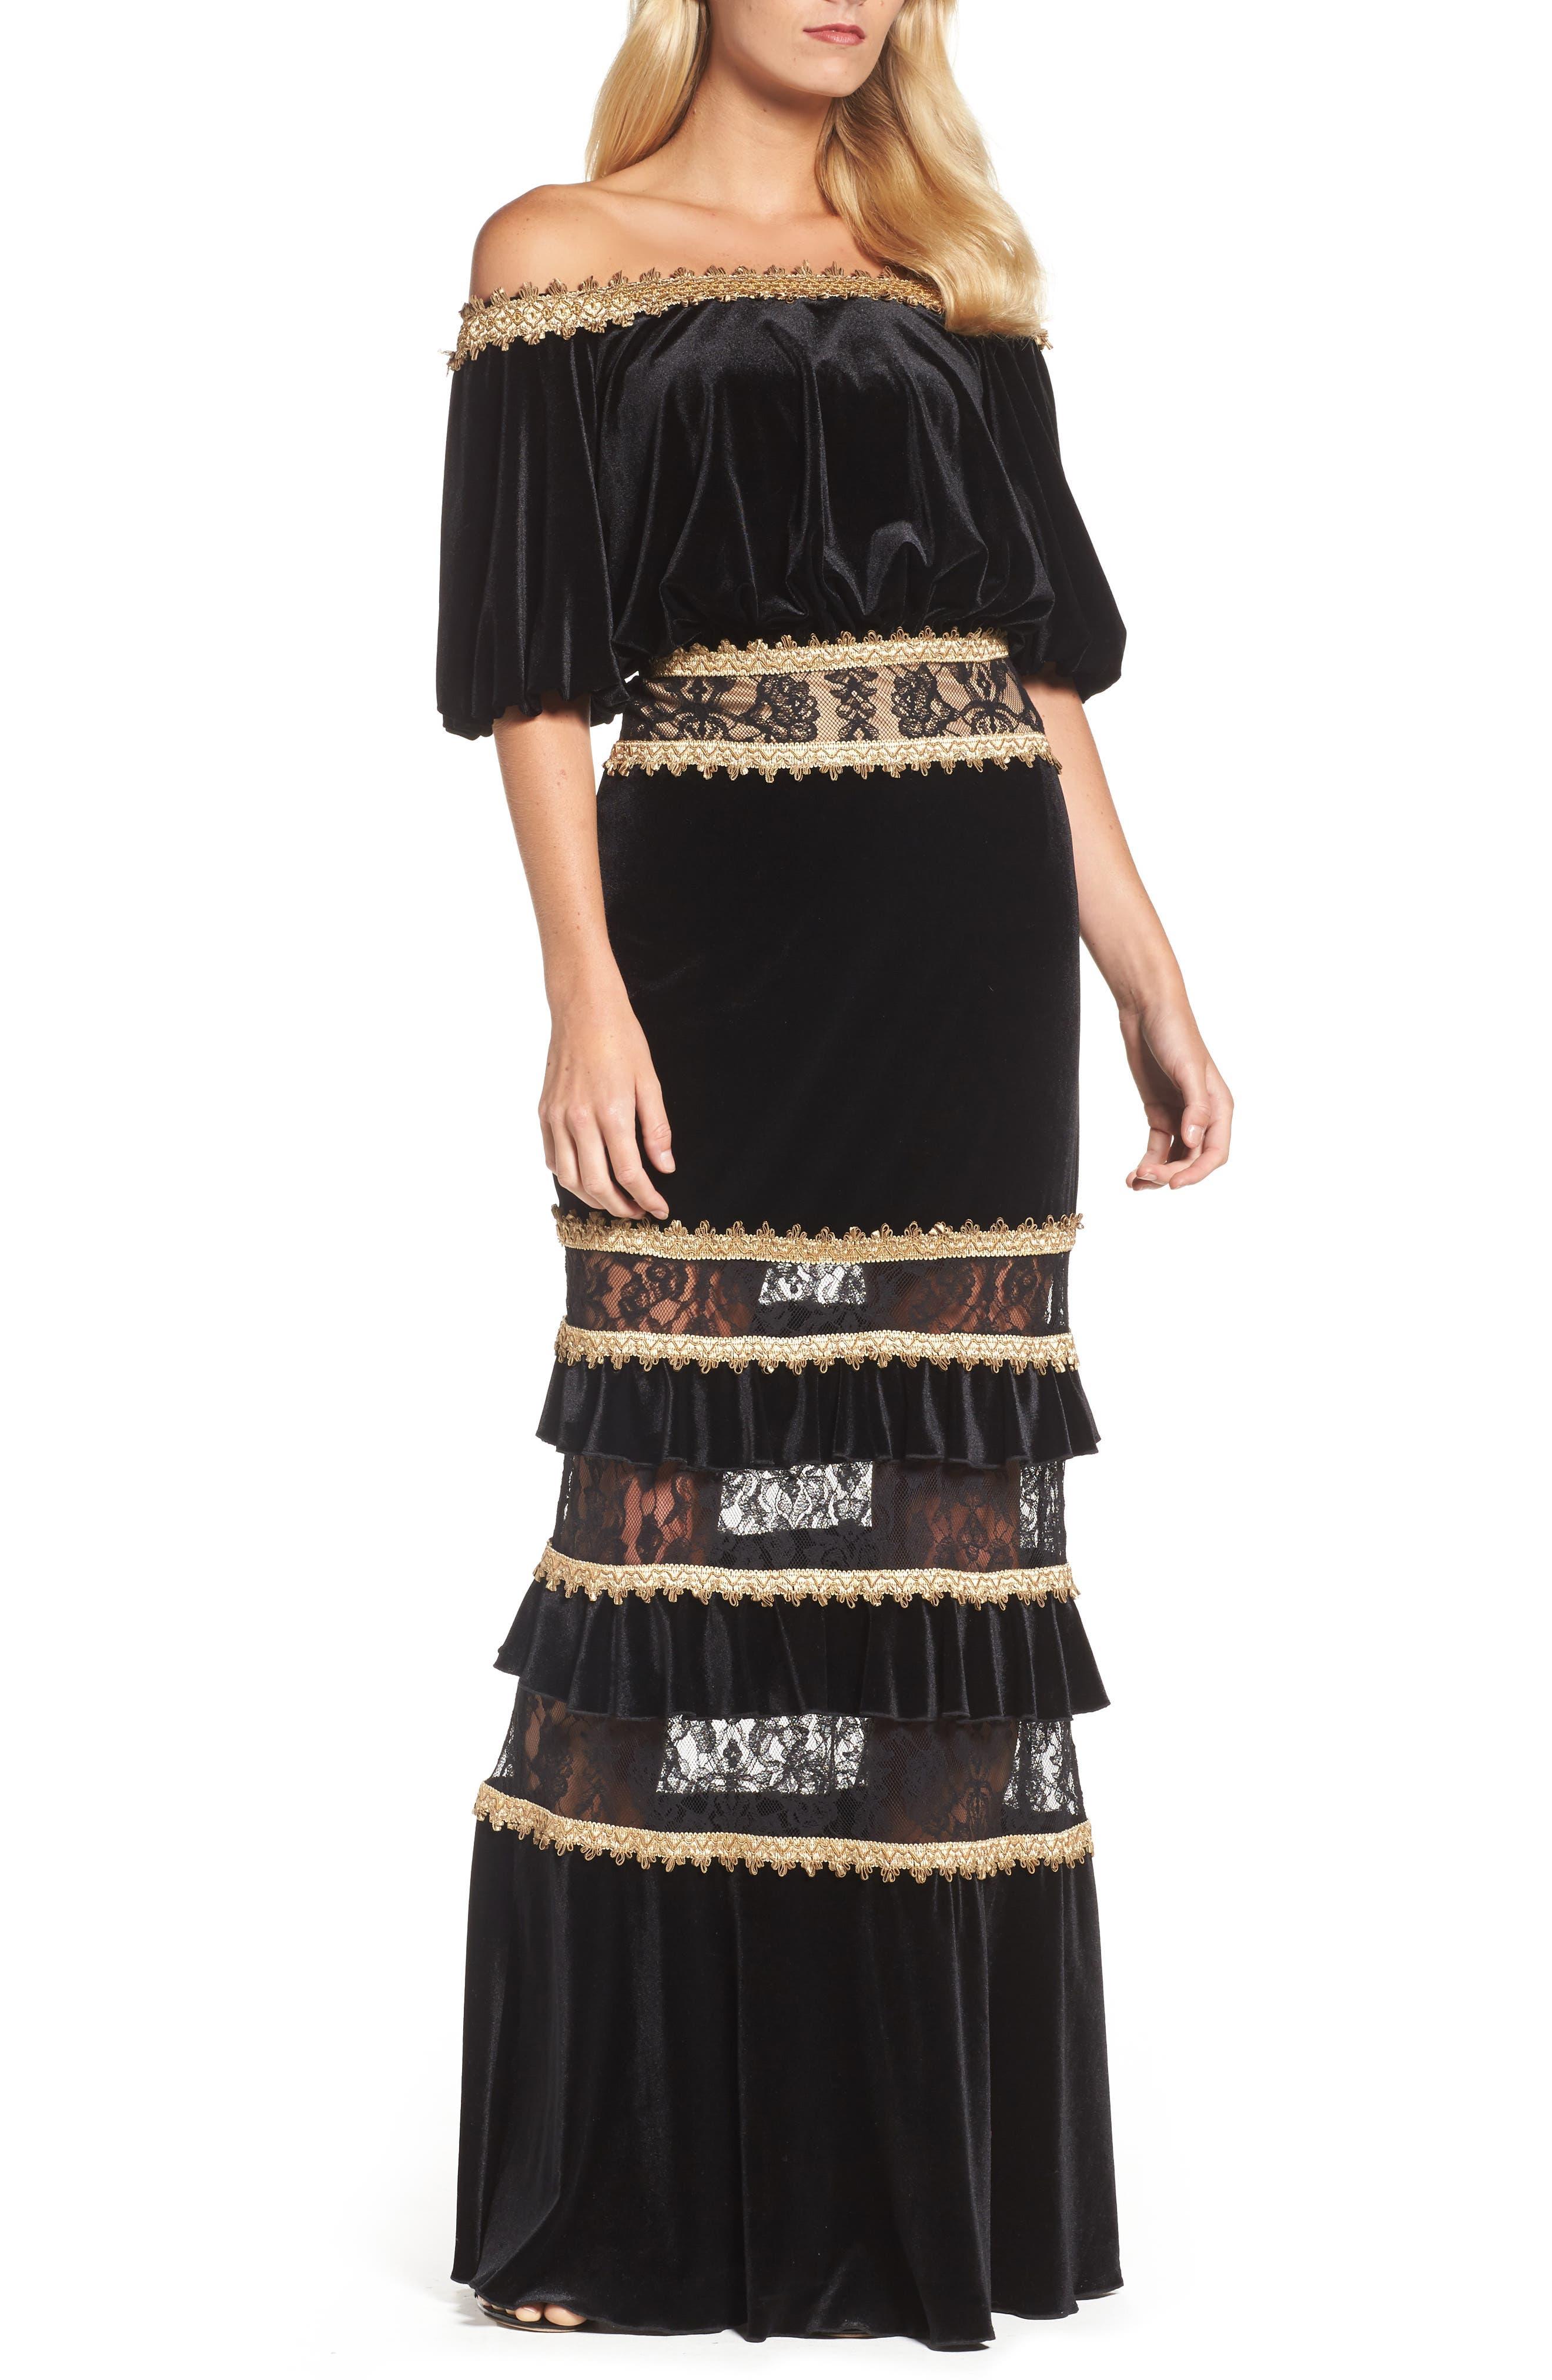 Alternate Image 1 Selected - Tadashi Shoji Velvet Ruffle & Lace Off the Shoulder Gown